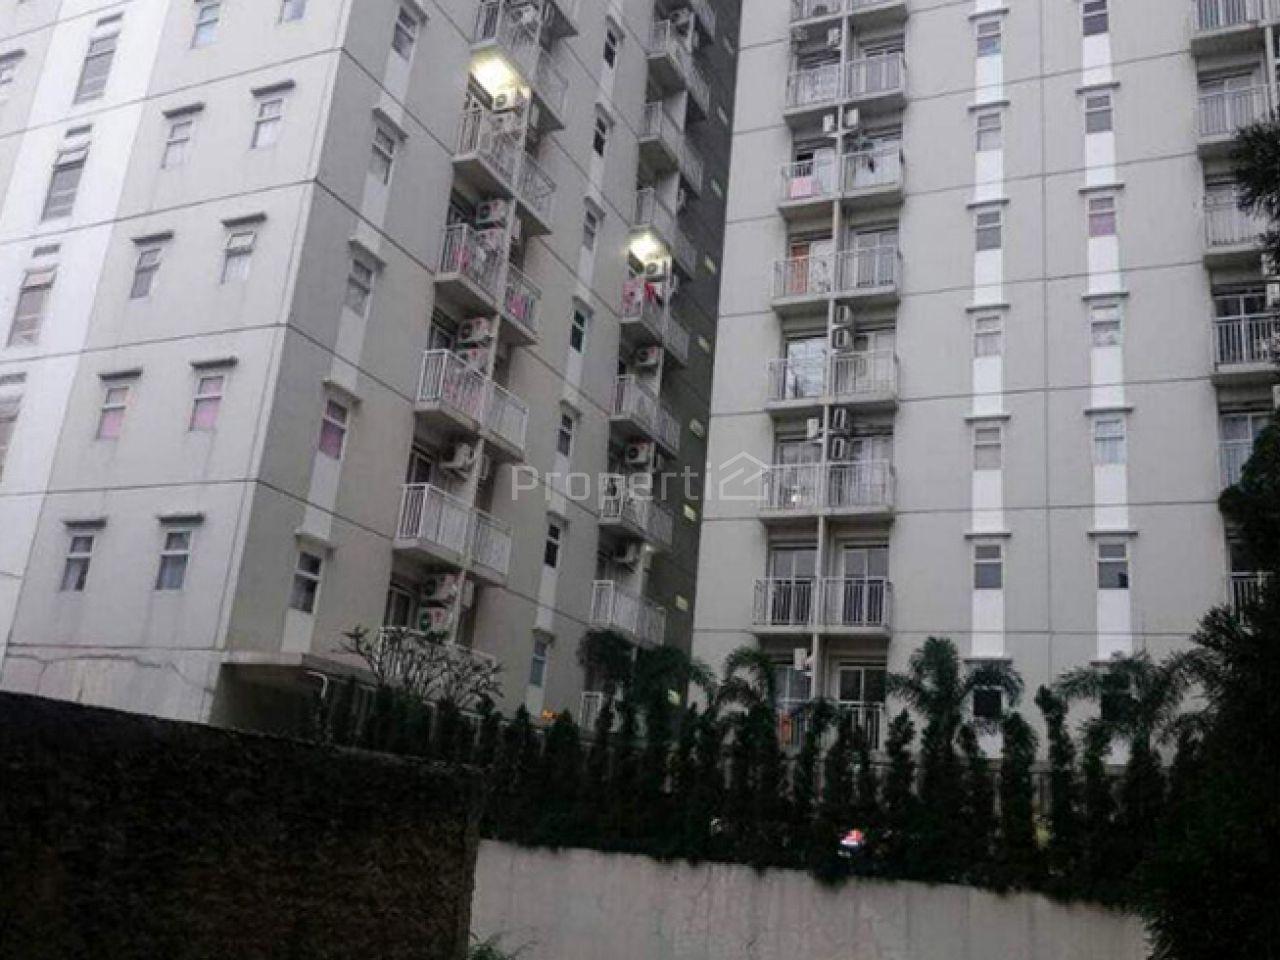 Unit 2 Kamar Baru di Lantai 5 Tower A, Apartemen Bogor Valley, Jawa Barat